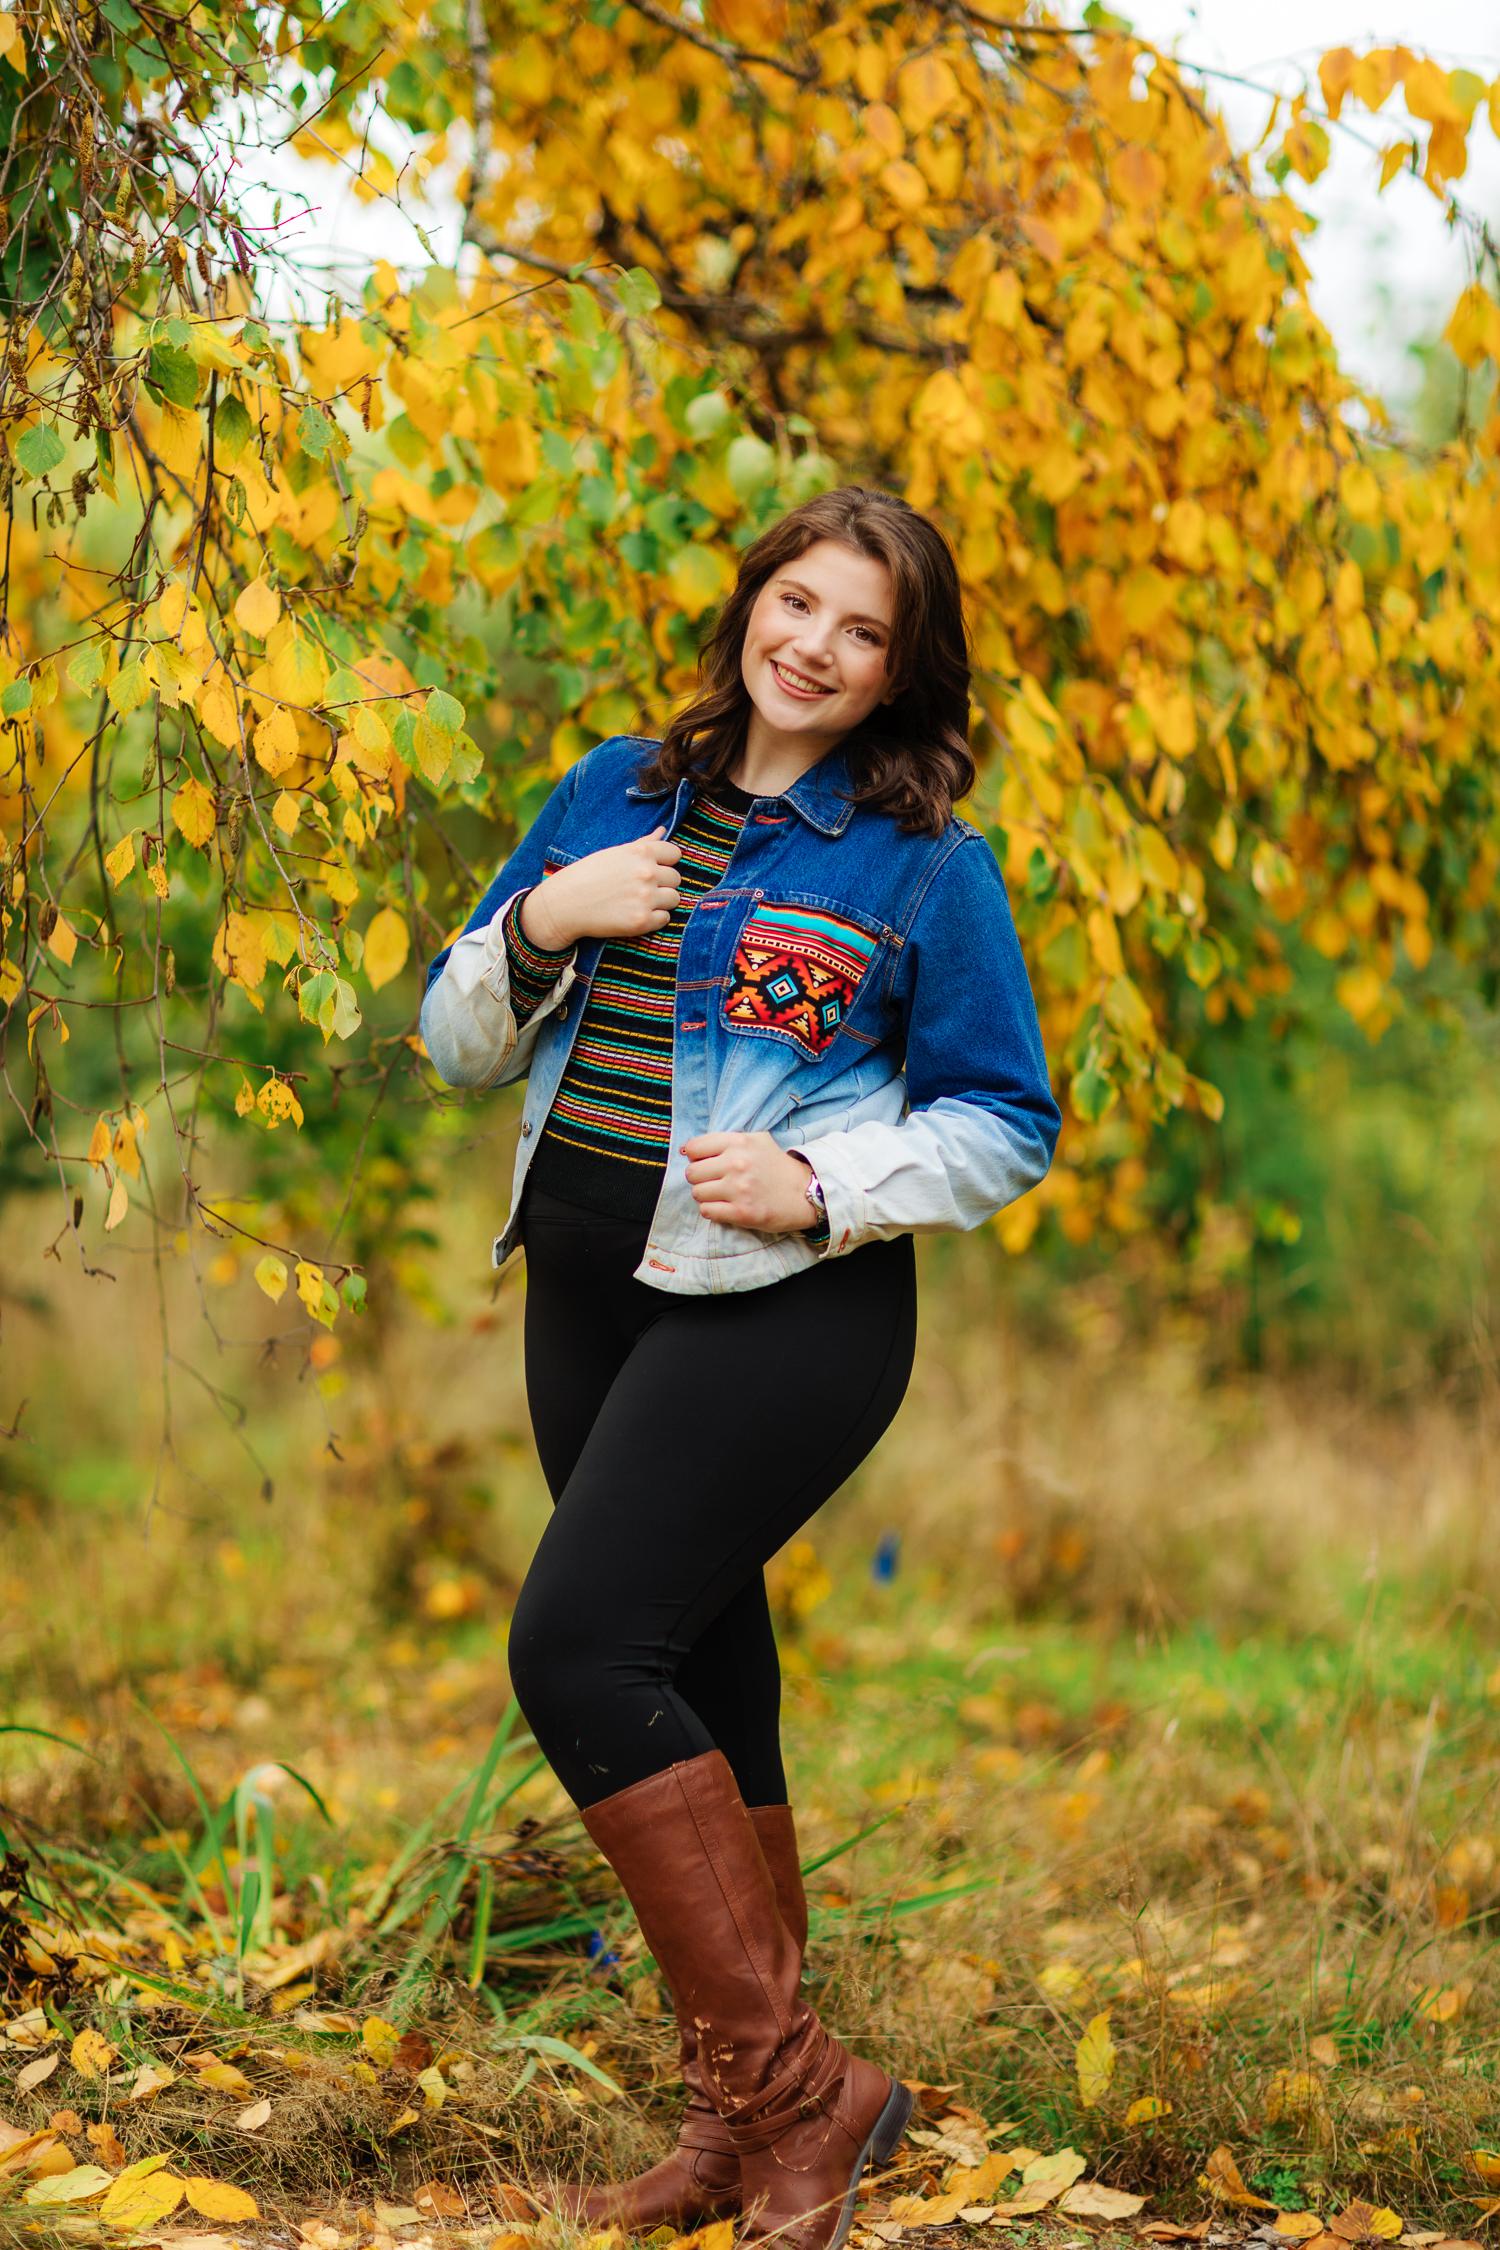 ariellanoellephotography-overlake-high-school-senior-portraits-top-seattle-area-highschool-senior-photographer-1-10.jpg